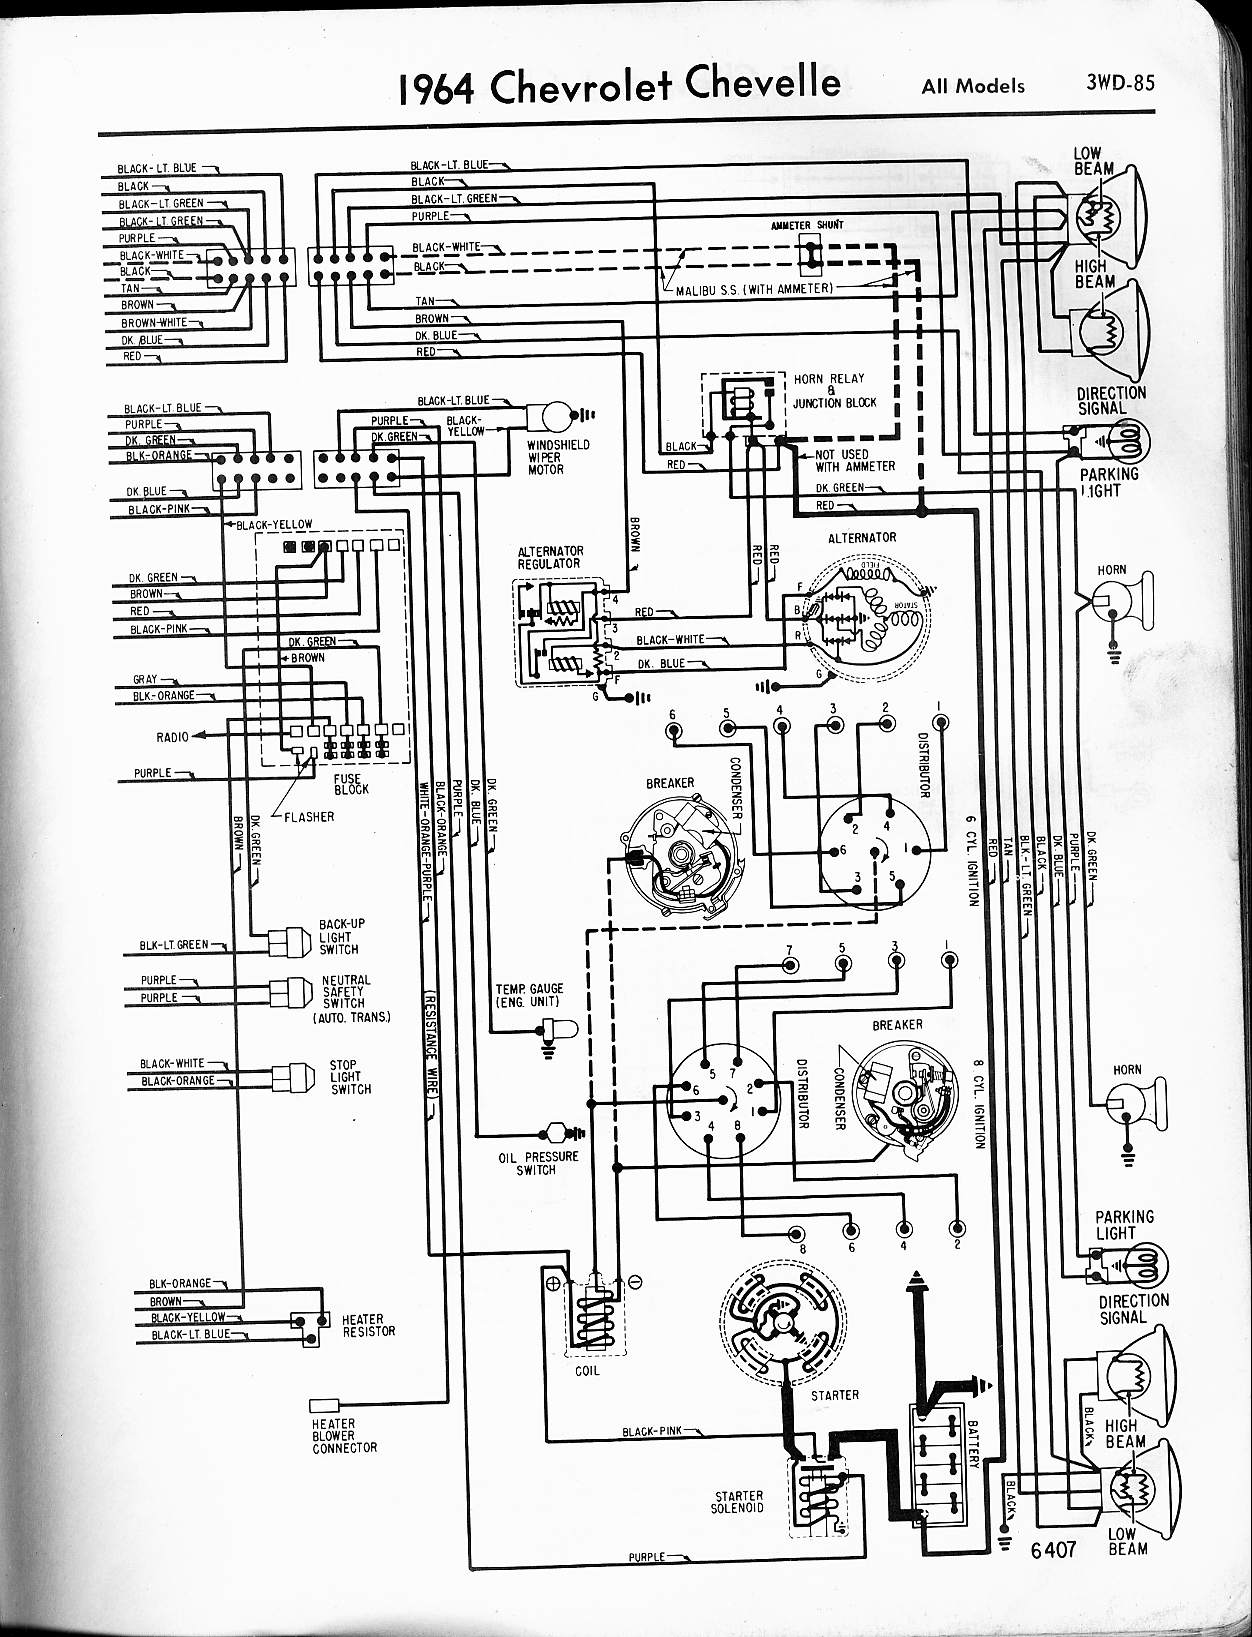 1965 chevrolet malibu wiring diagrams for